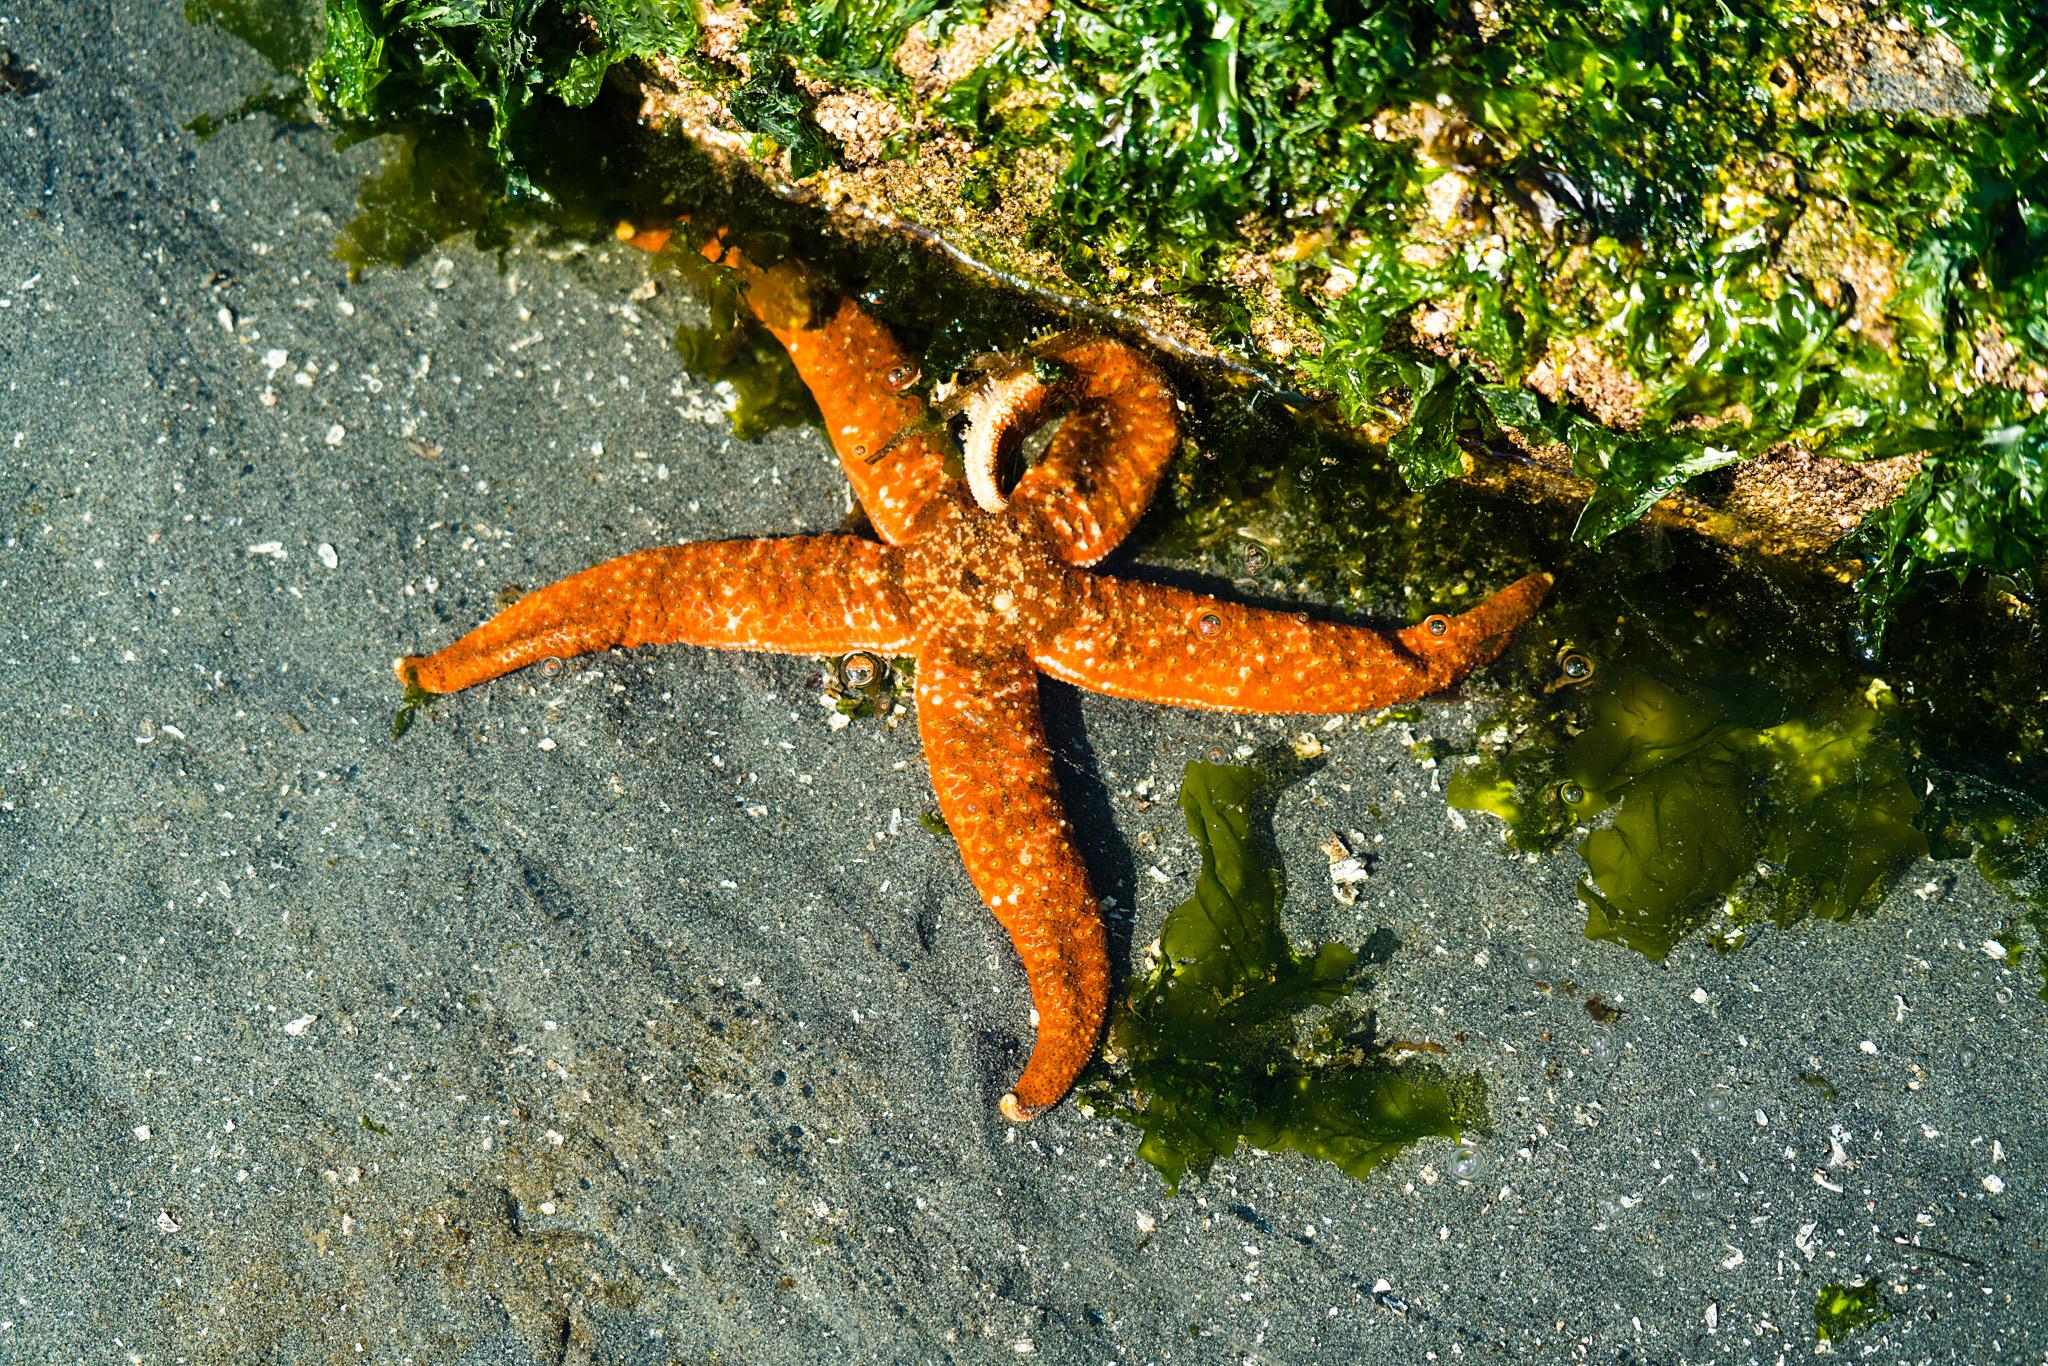 Sea Star on the beach in Seattle, Washington